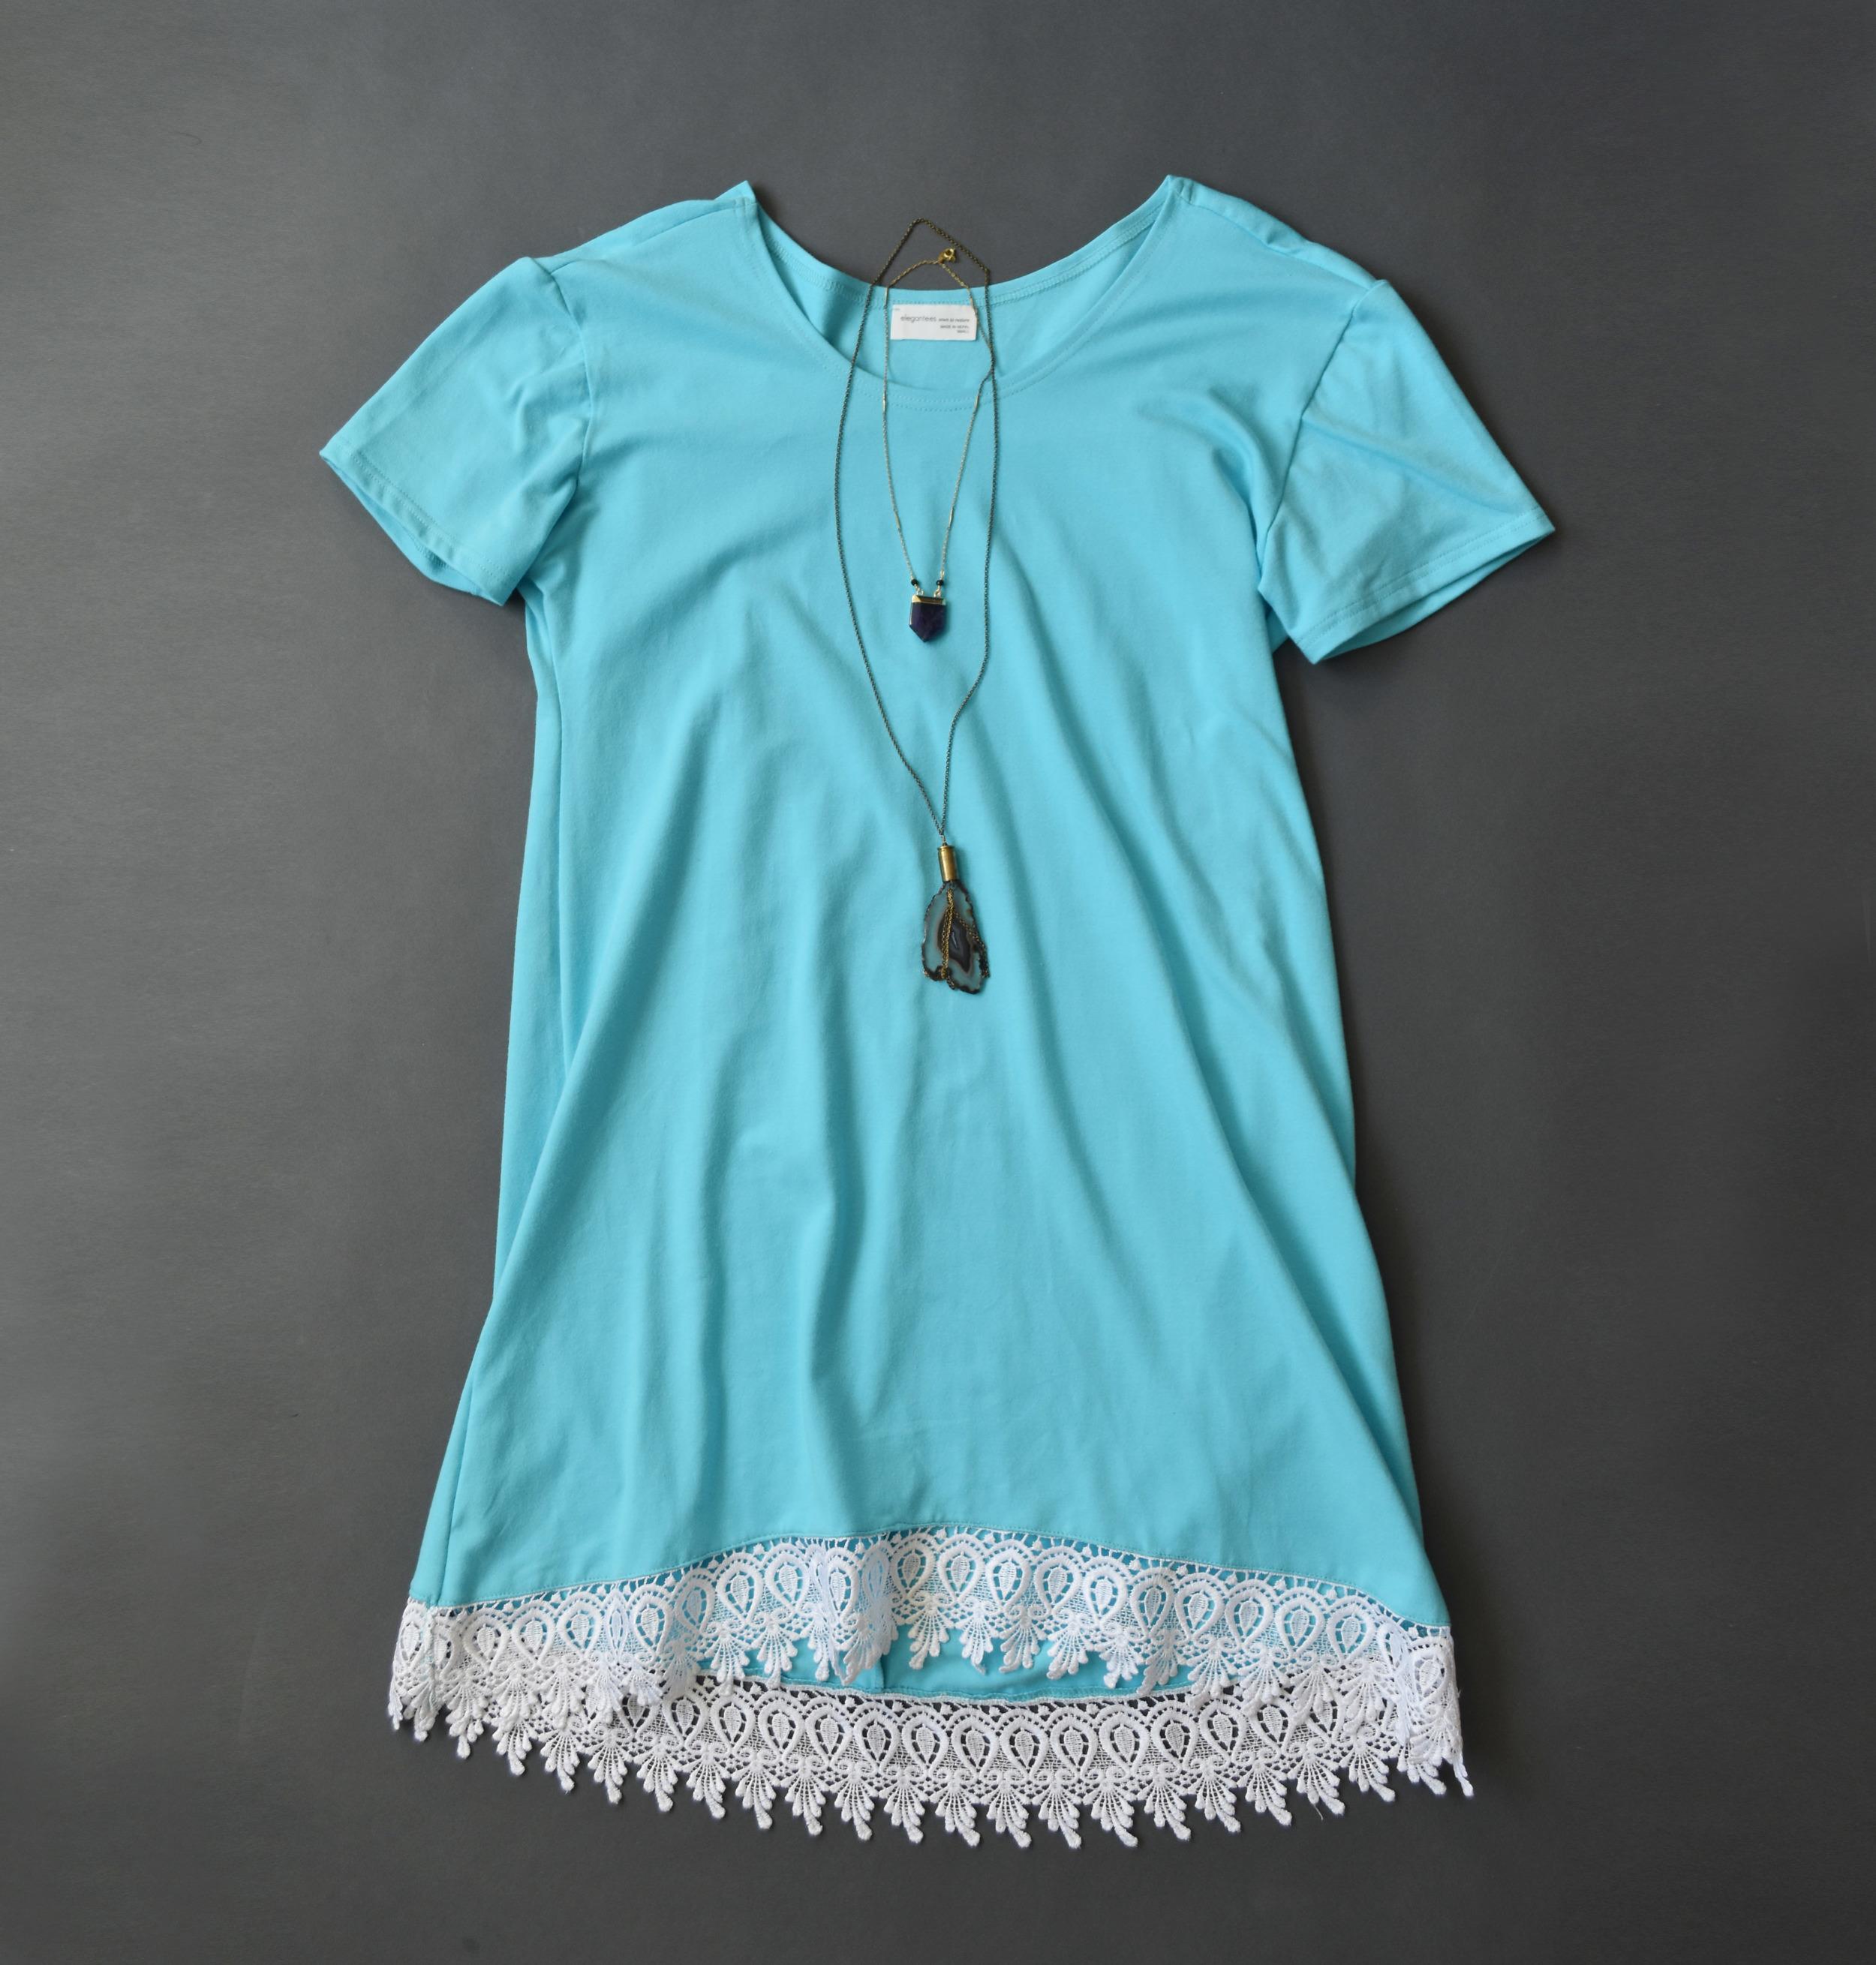 ethical-fashion-fair-trade-clothing